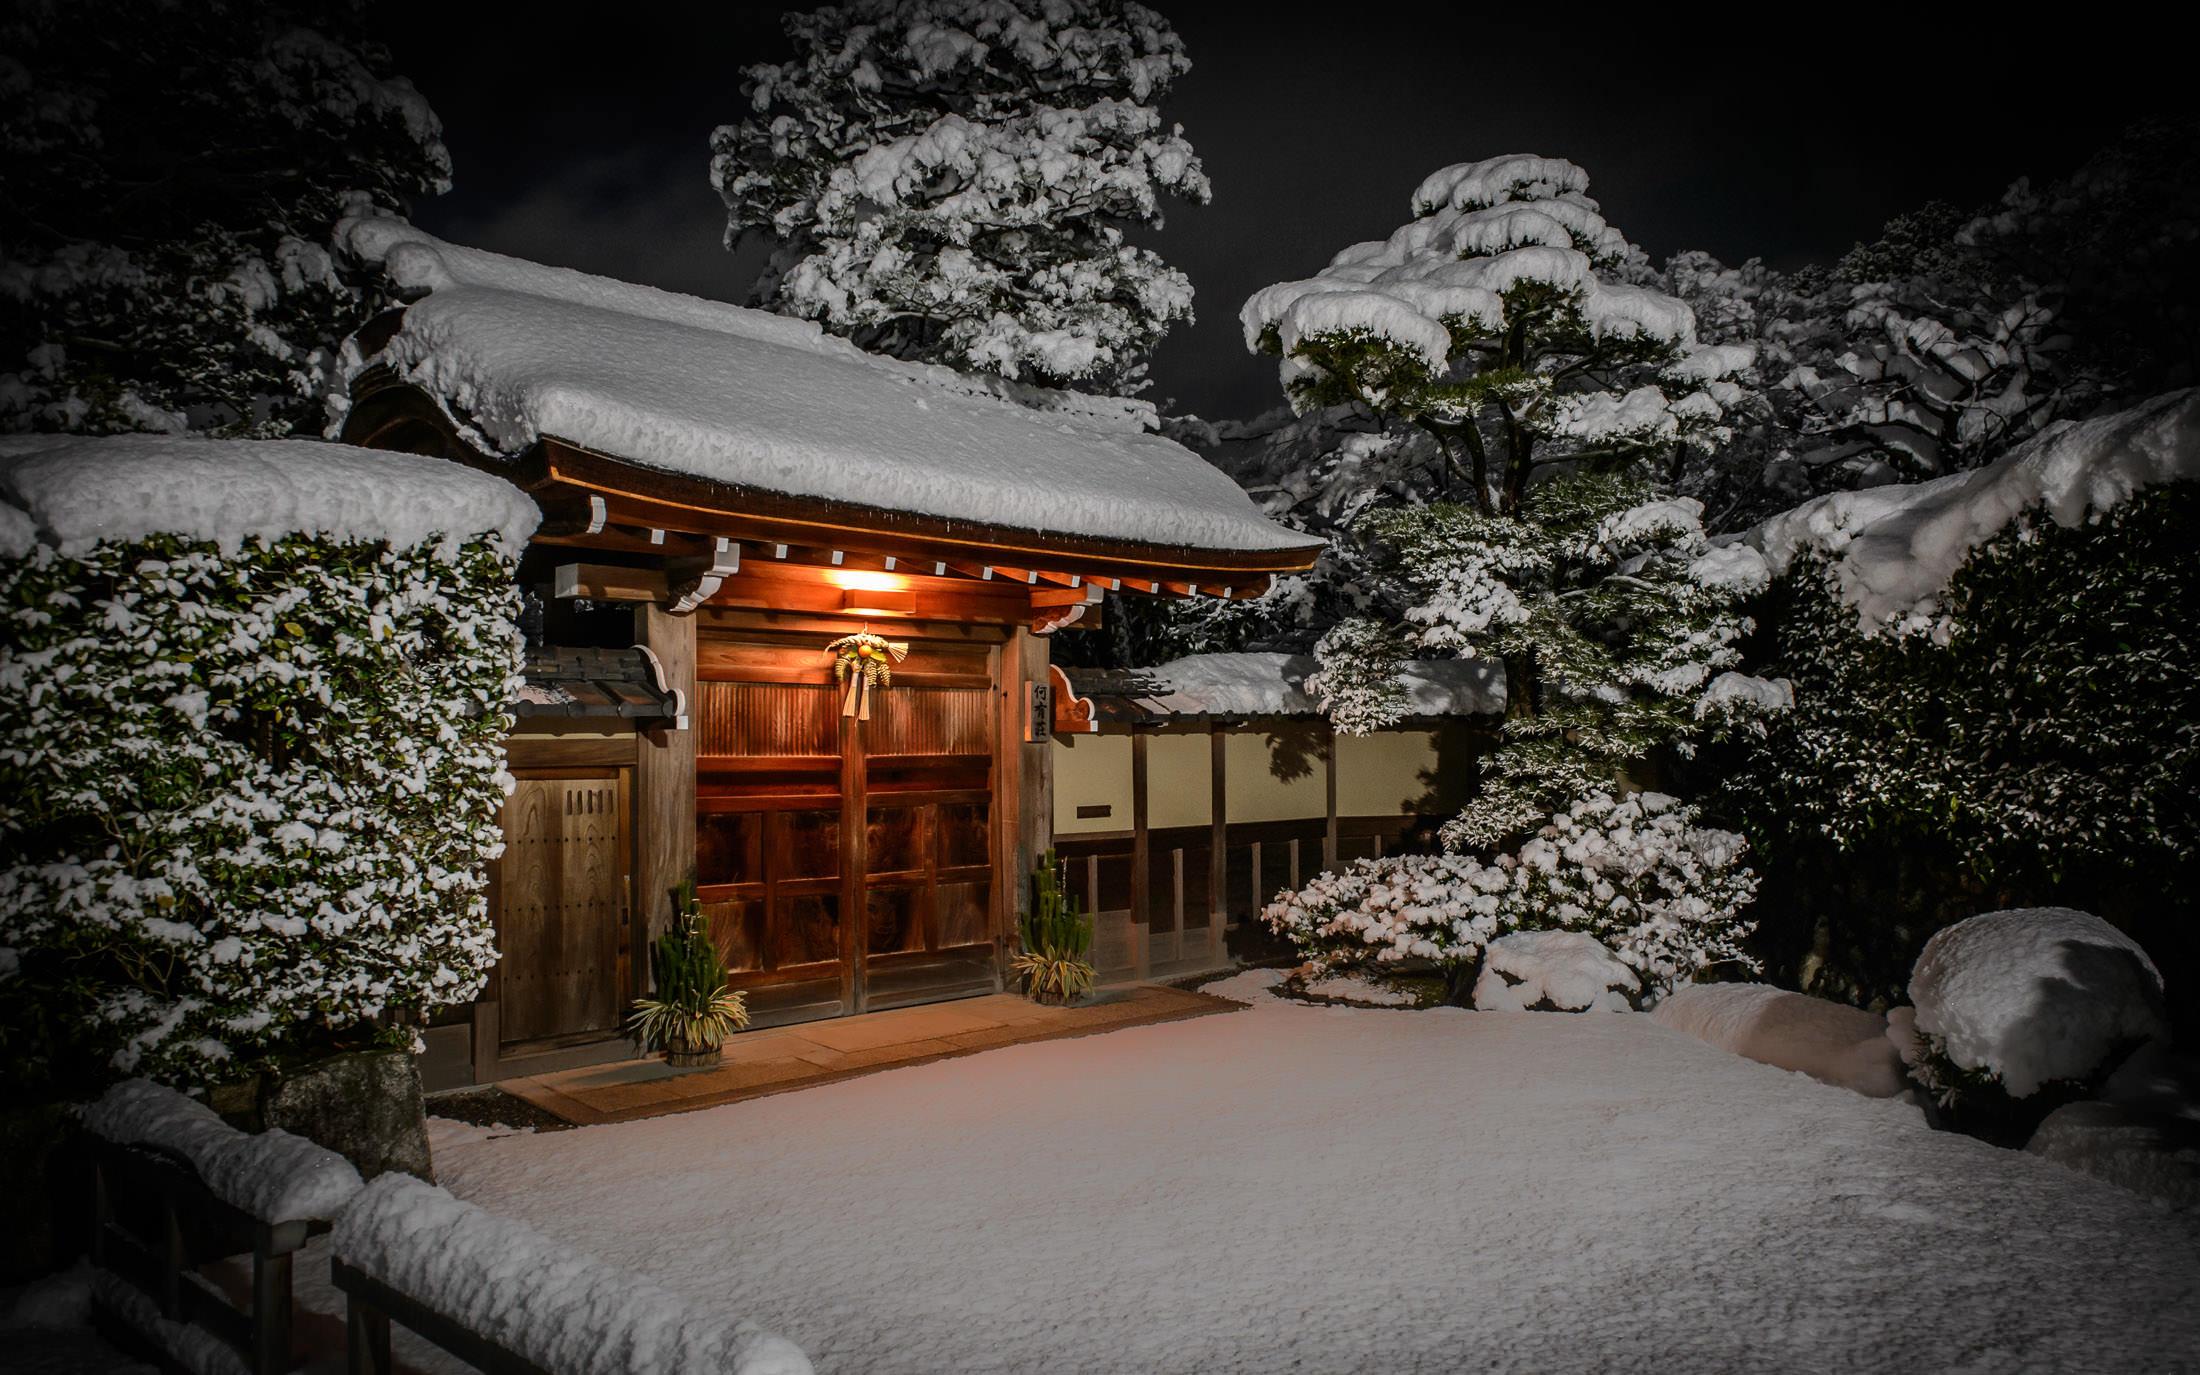 Snow Falling Desktop Wallpaper Jeffrey Friedl S Blog 187 Kyoto At Night During A Heavy Snow